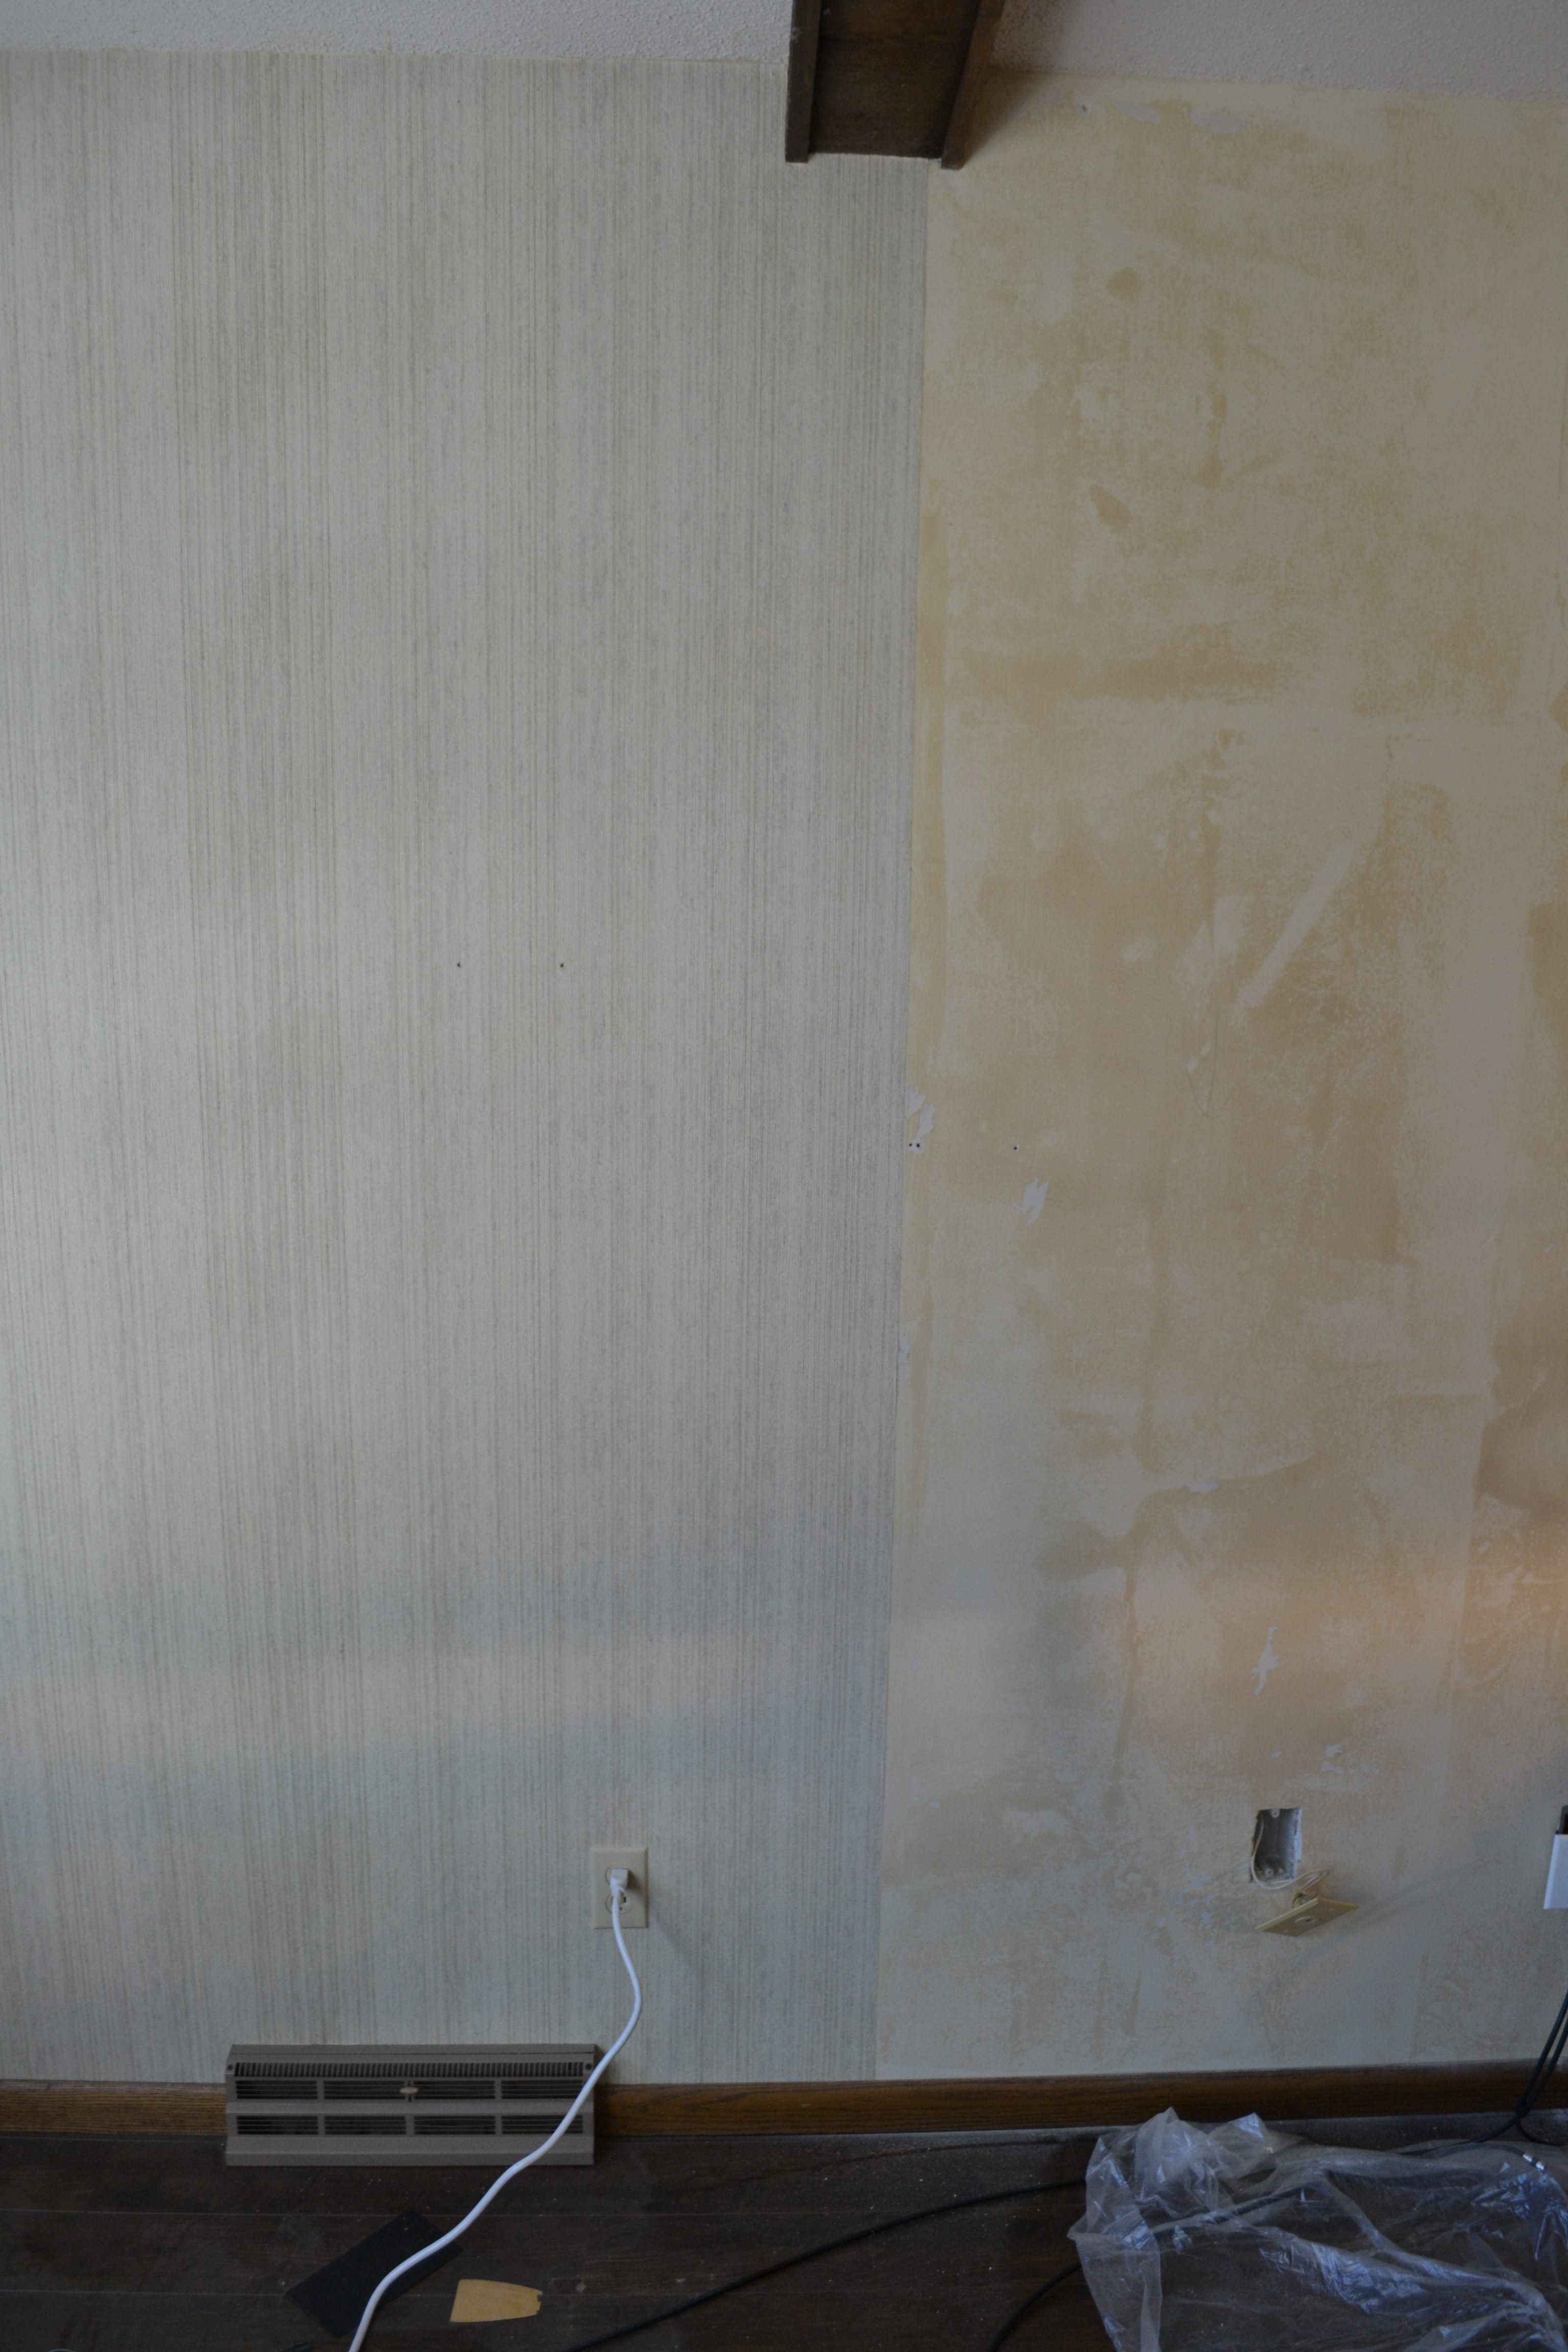 Removing Textured Wallpaper Textured Wallpaper Removing Textured Walls Wallpaper